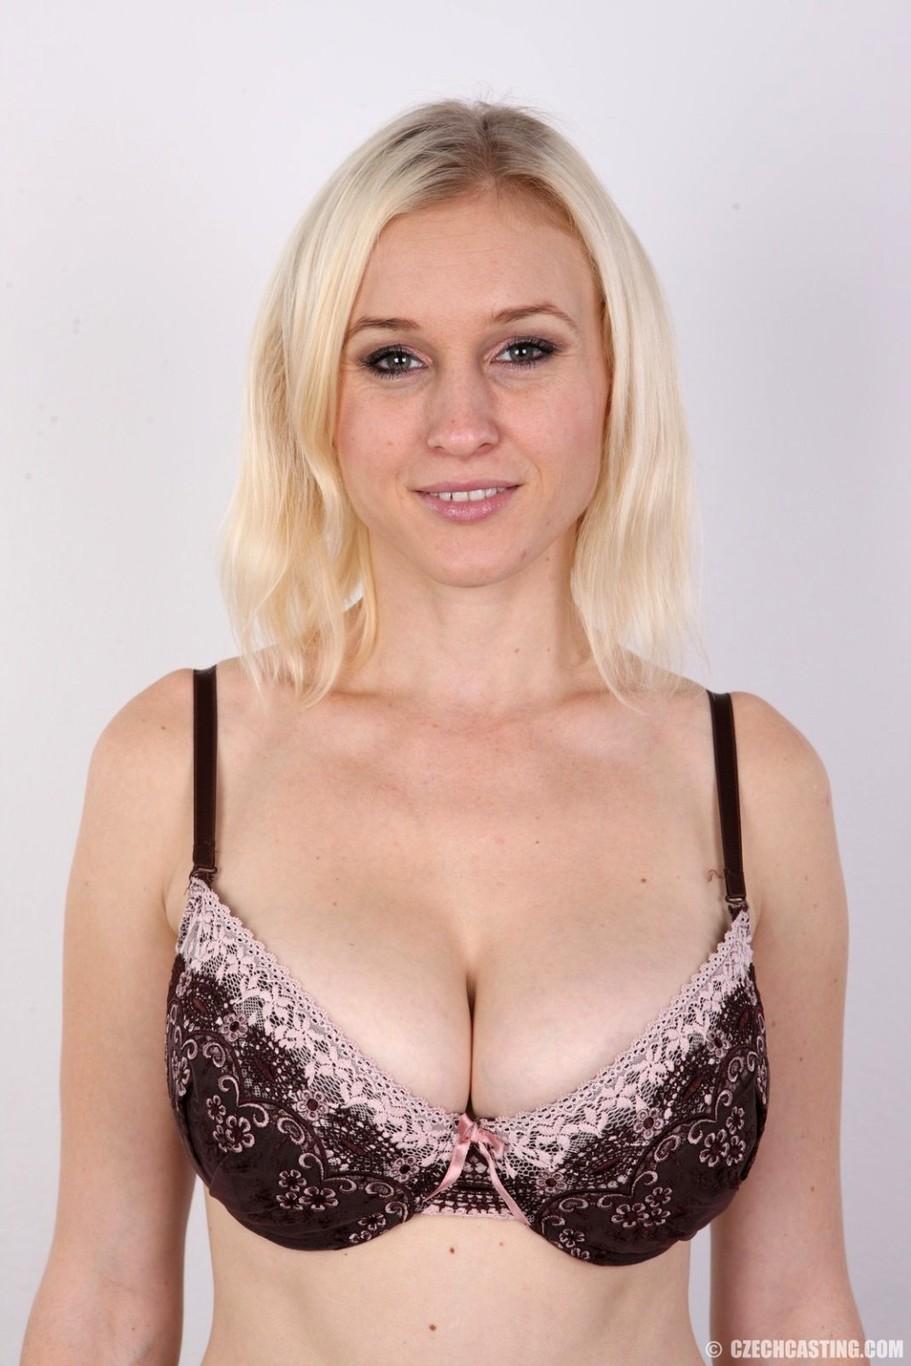 Big Tit Amateur Milf Casting 'big tit milf casting' Search